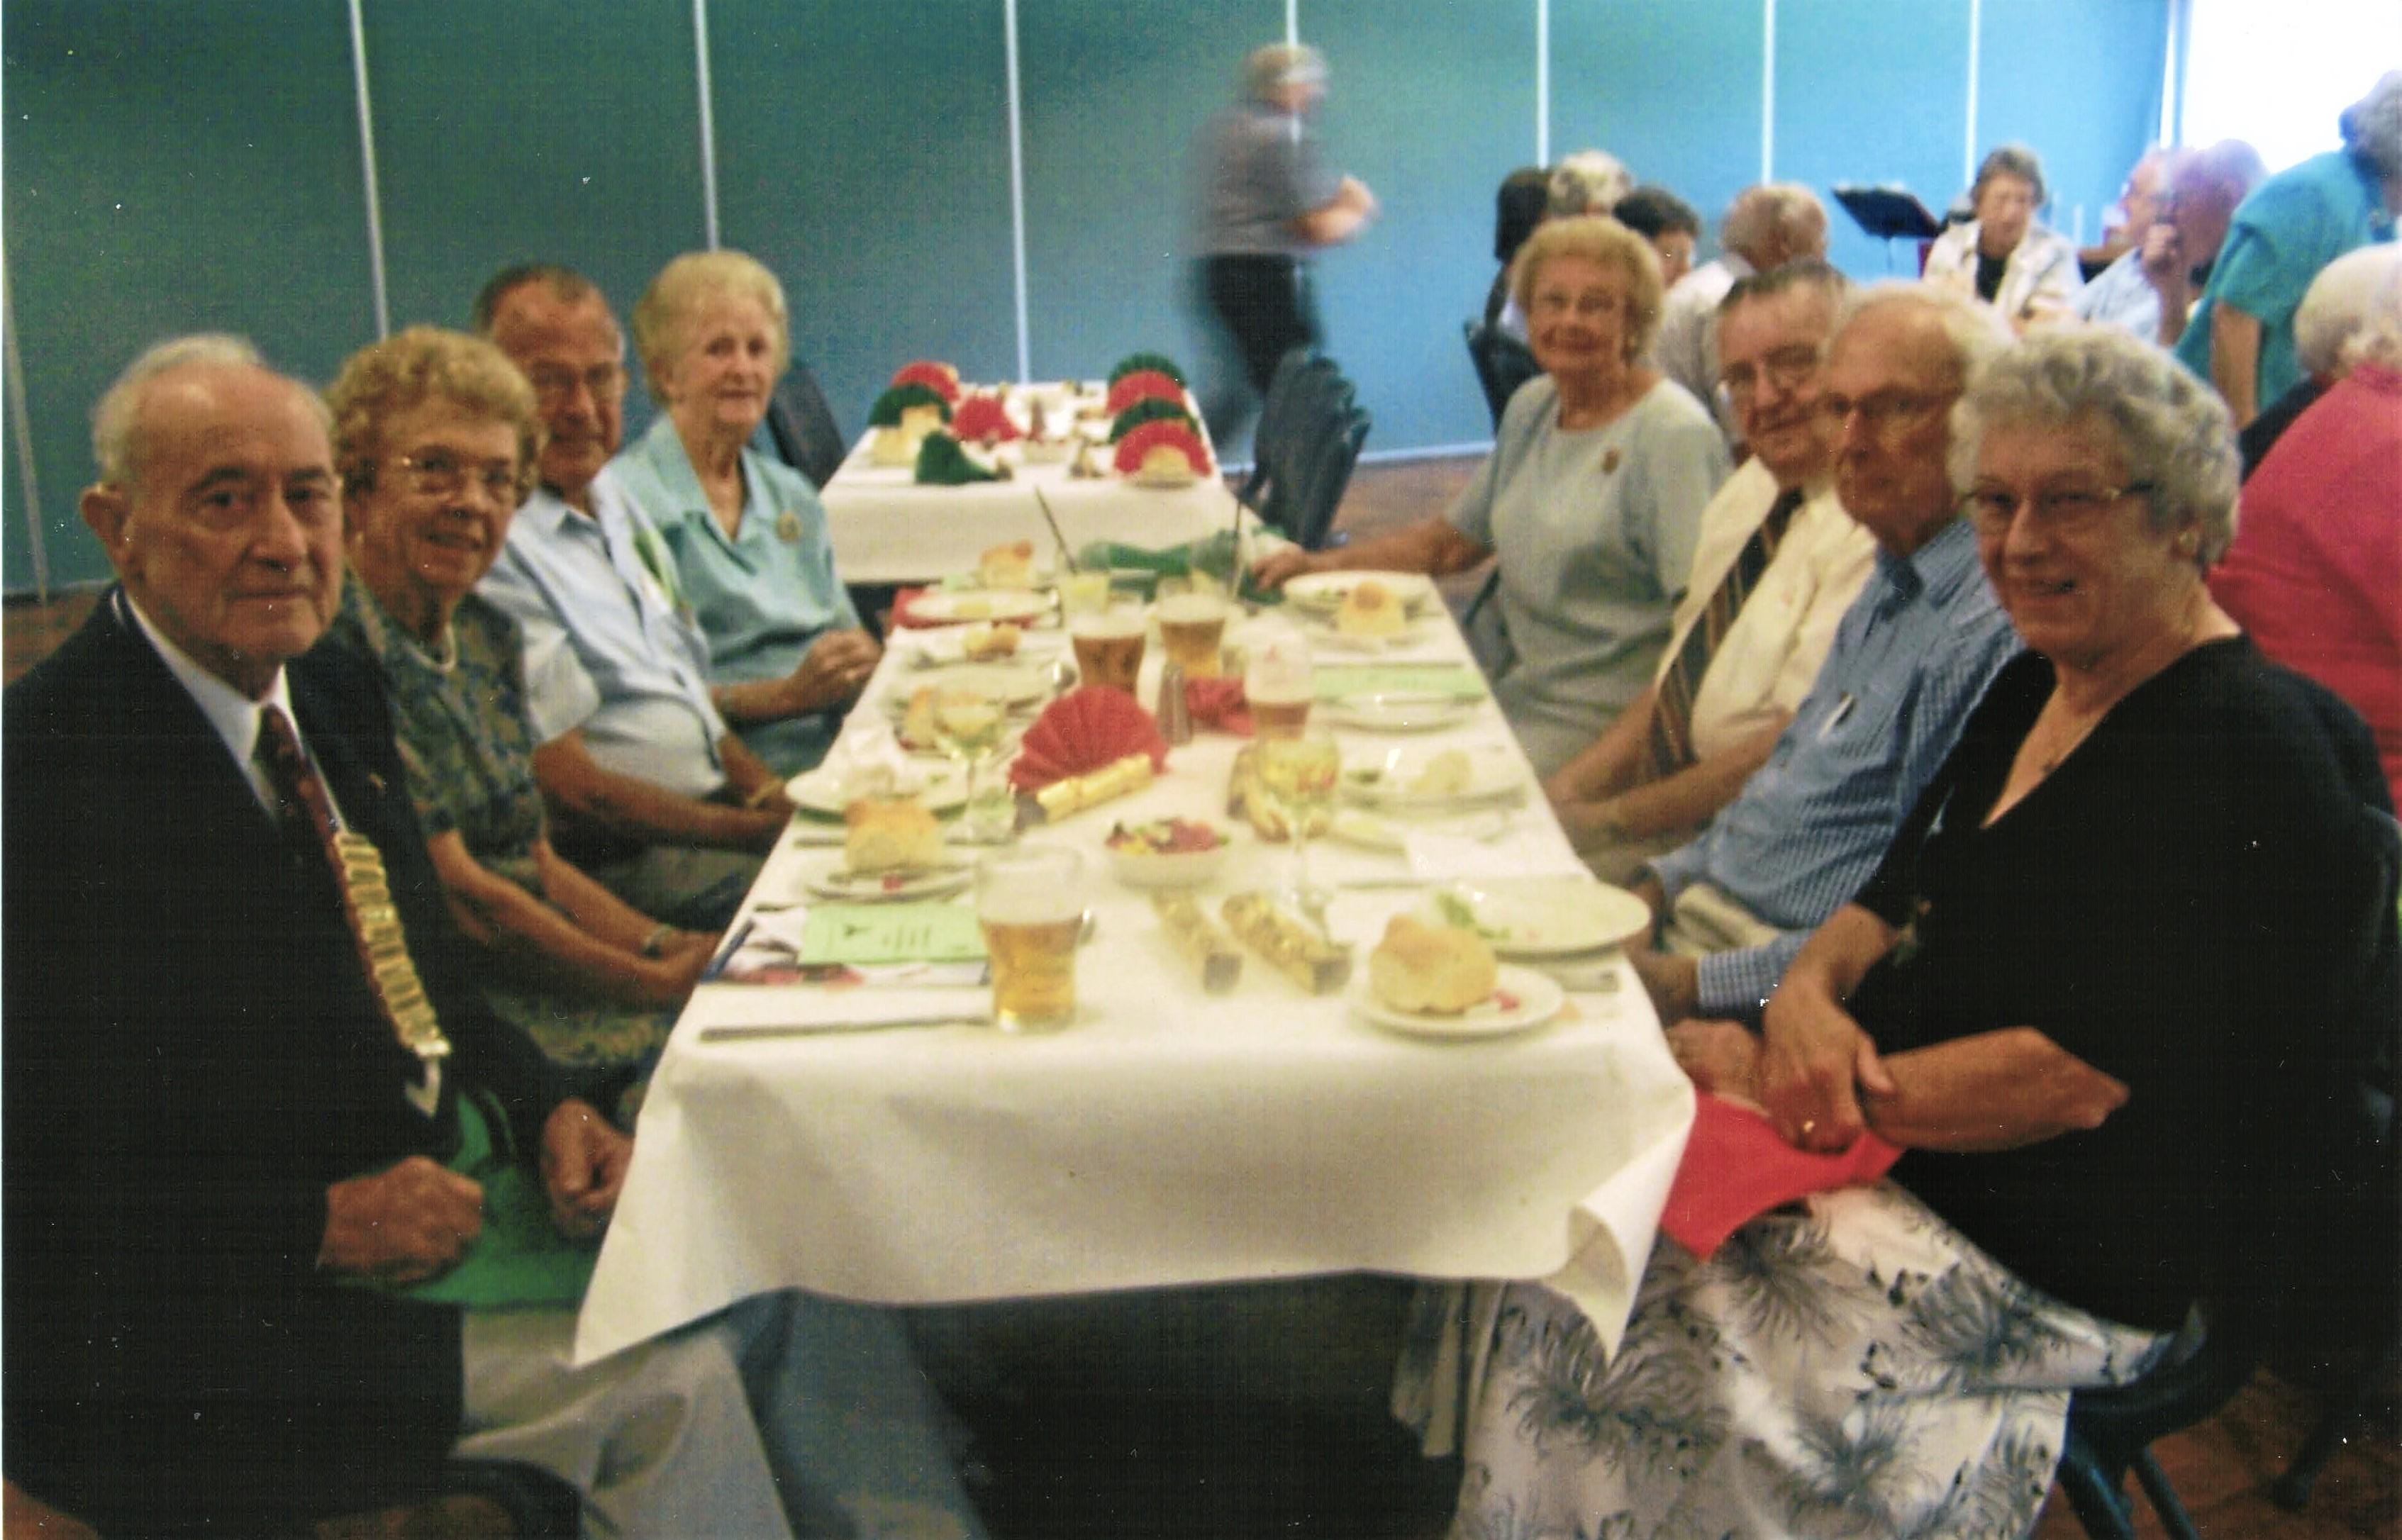 2008 Activities Christmas Luncheon at Av